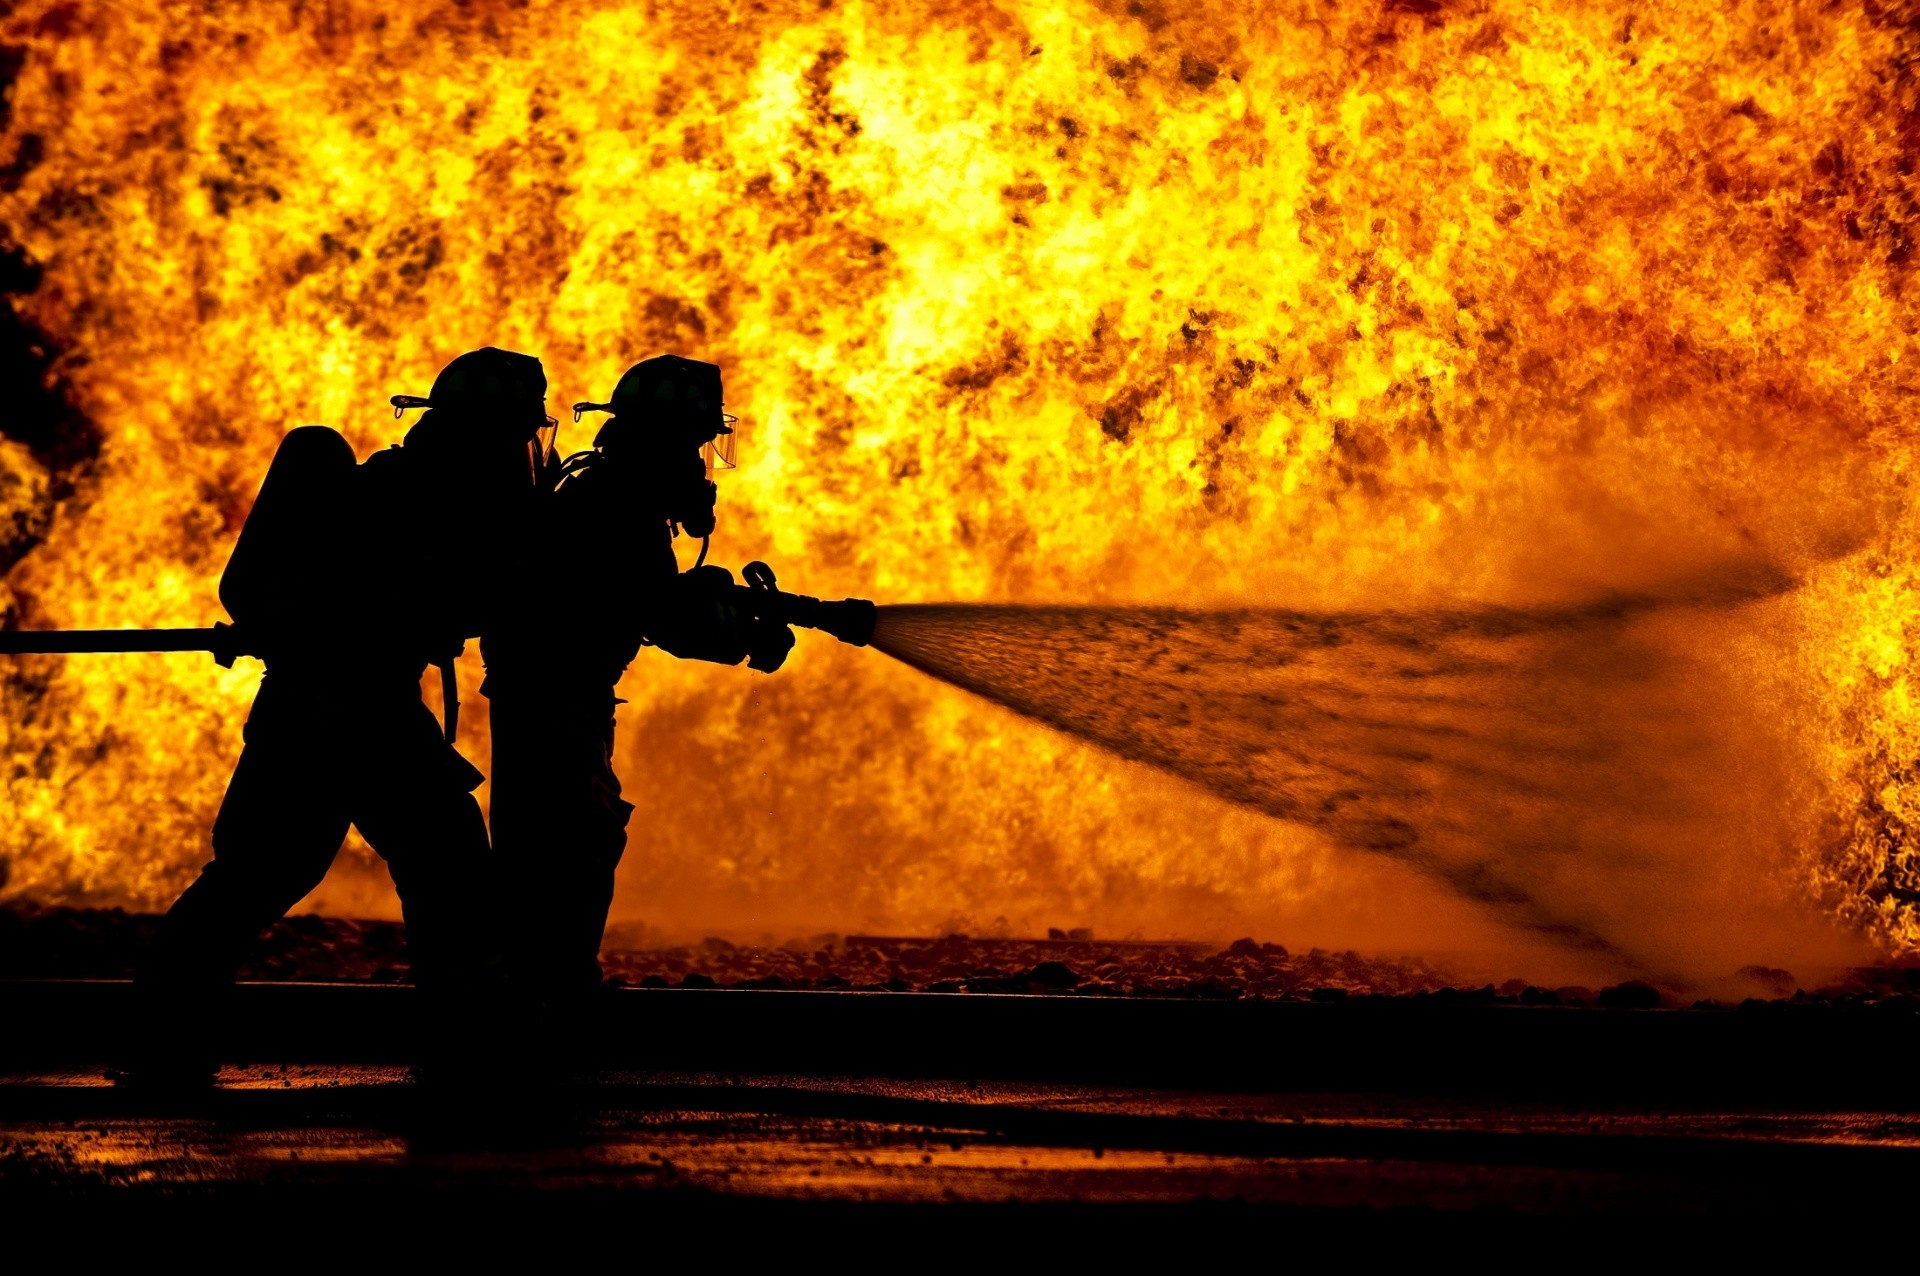 1920x1276 Firefighter Live Wallpaper Download 2600x1730